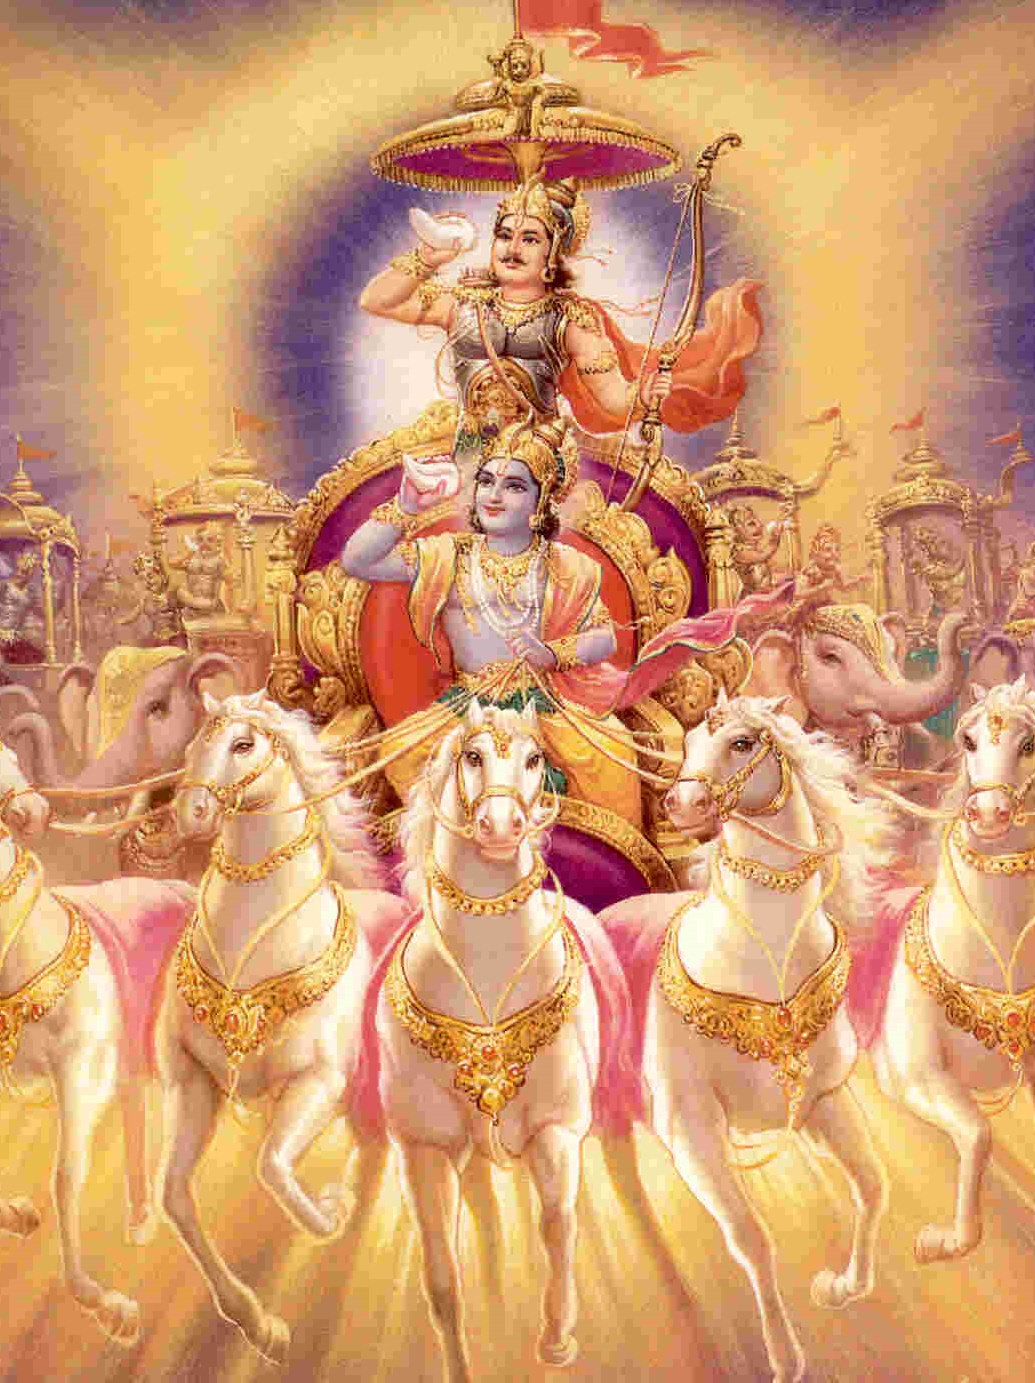 Fantastic Wallpaper Lord Name - God+Arjun+%26+krishna+Photo  Trends_216772.jpg